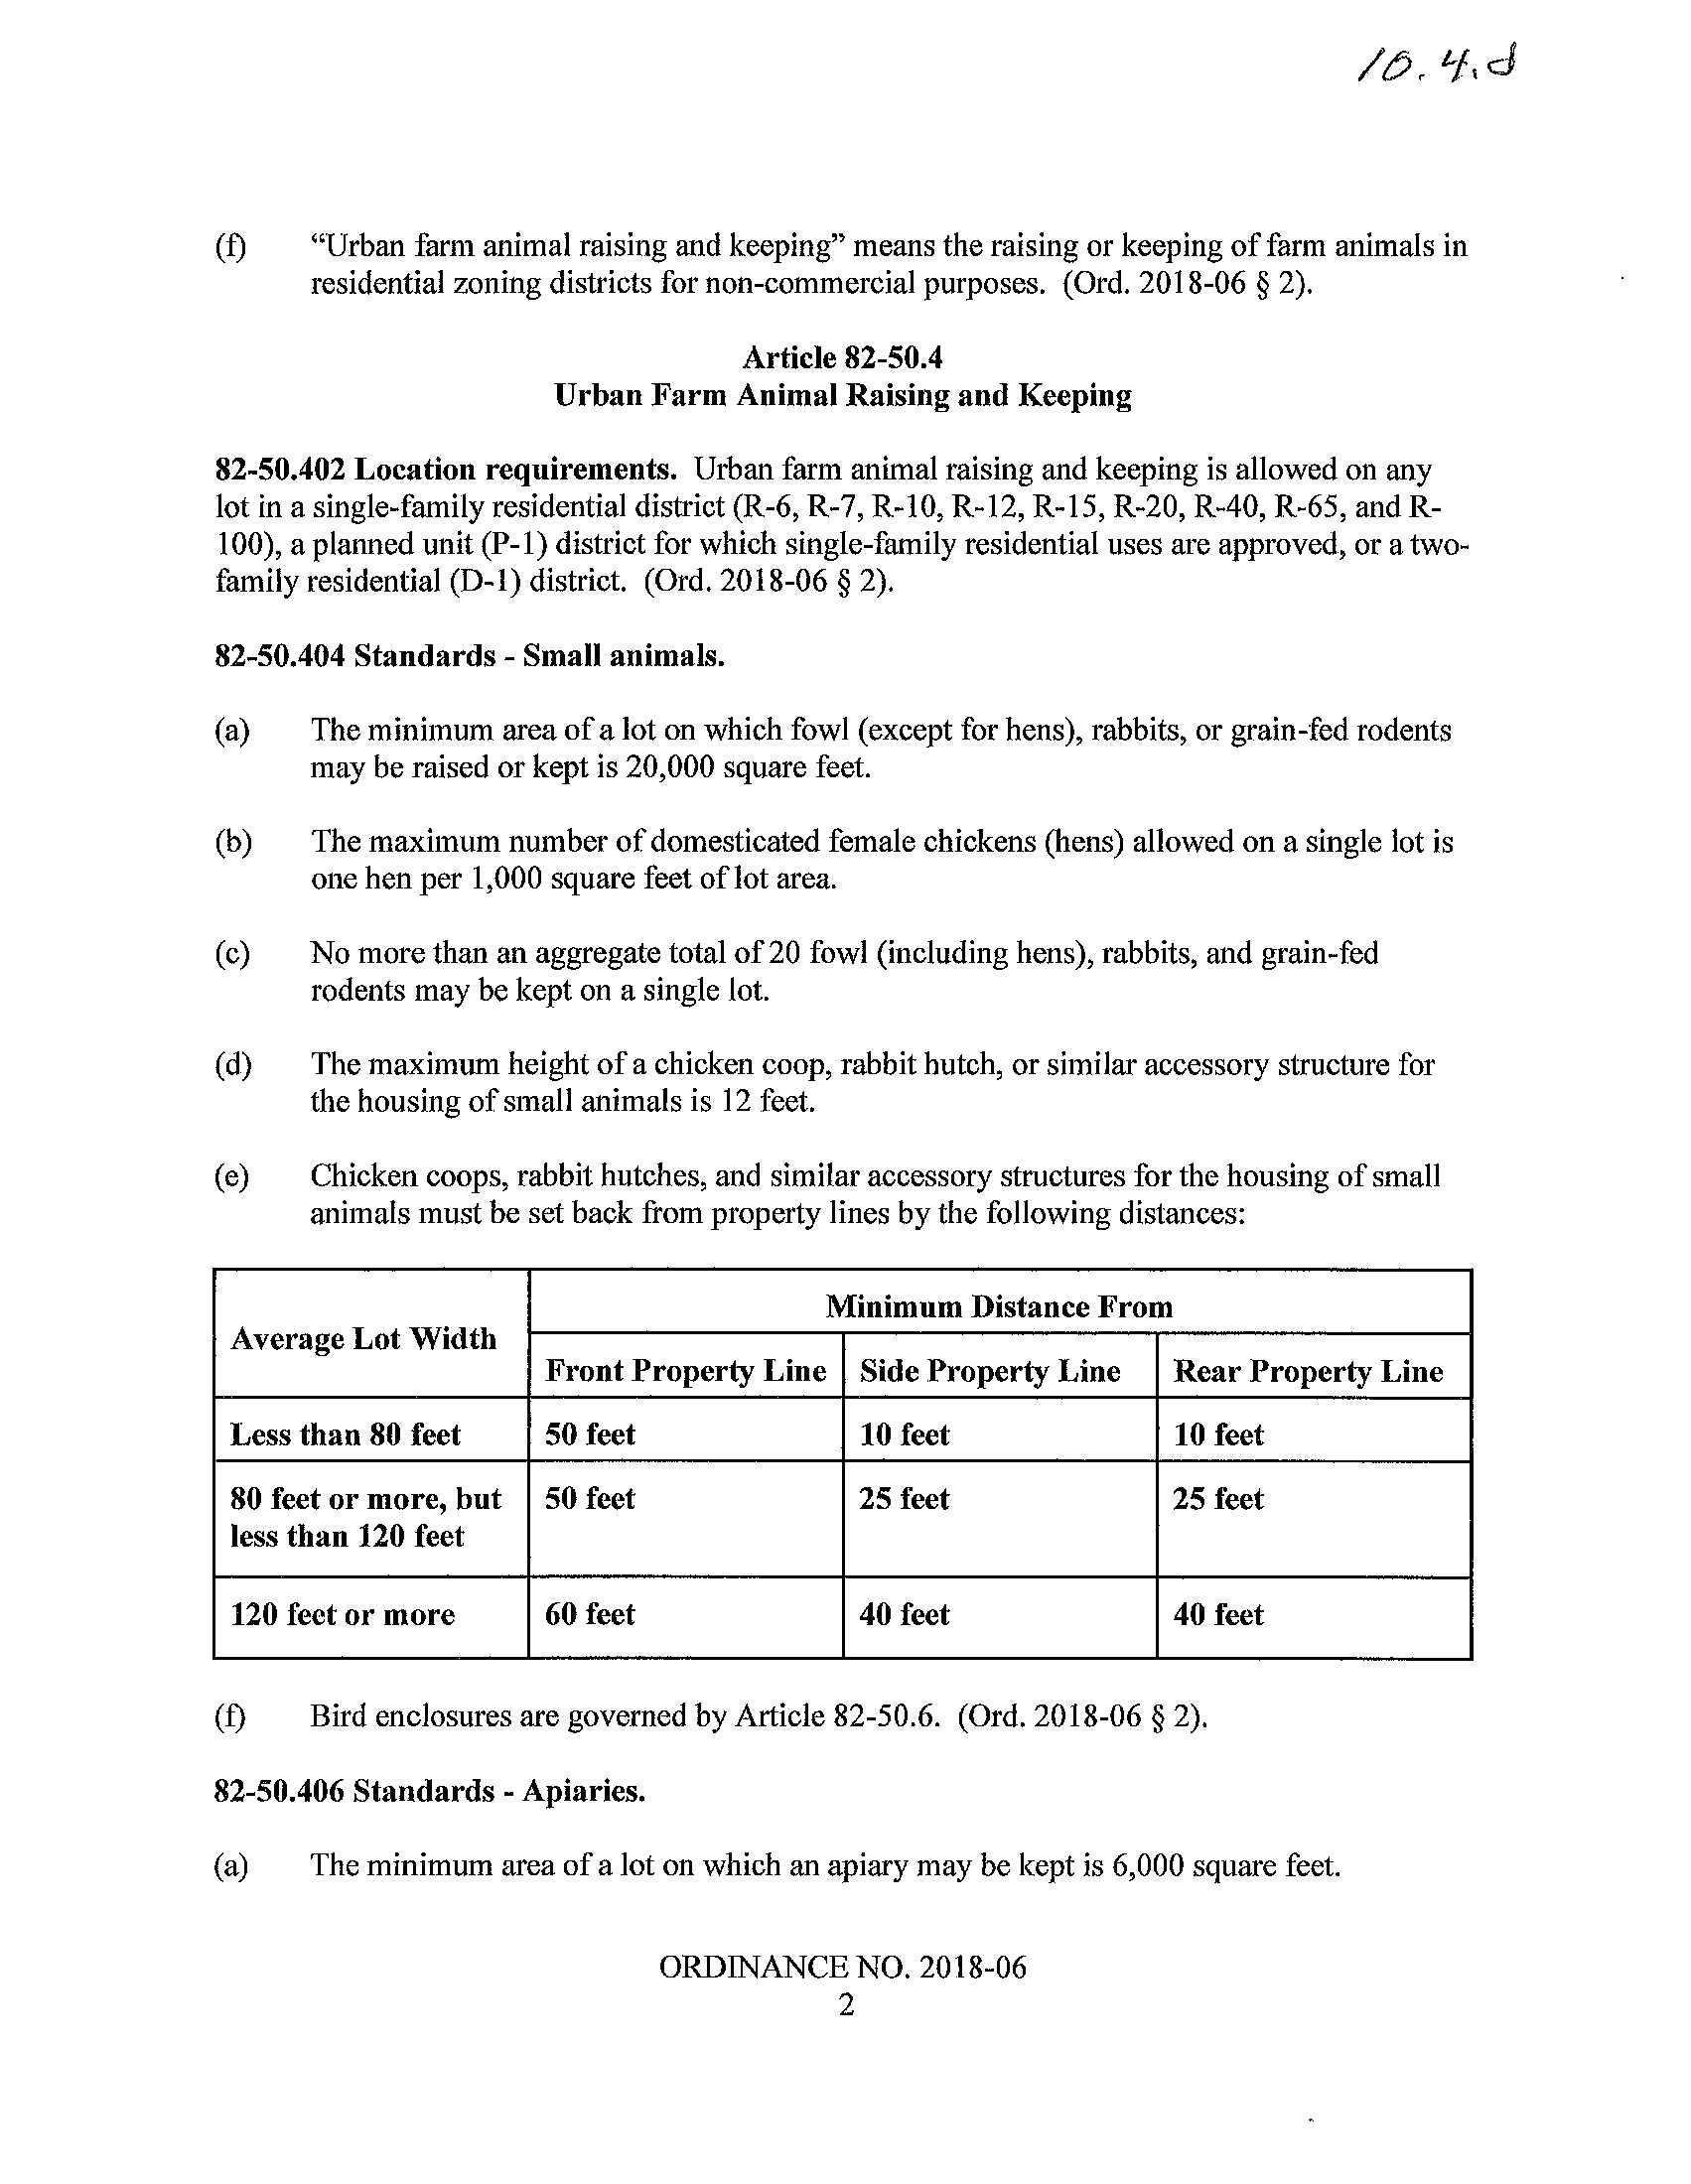 ESMAC Agenda 7.11.2018 (36 Pages)_25.jpg